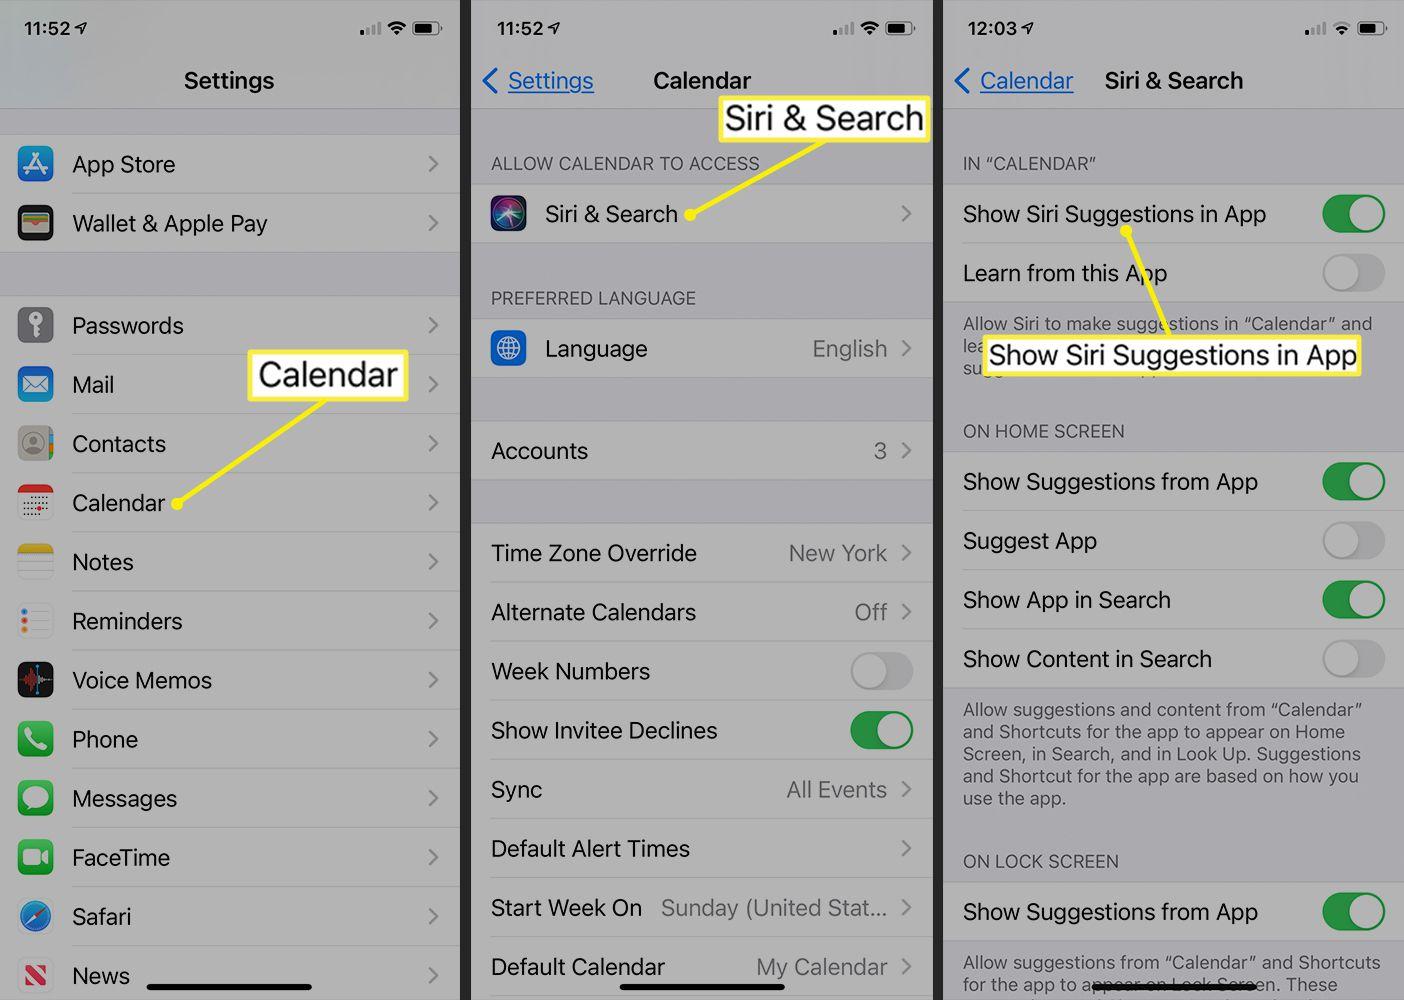 Siri & Search options in the iOS Calendar app settings